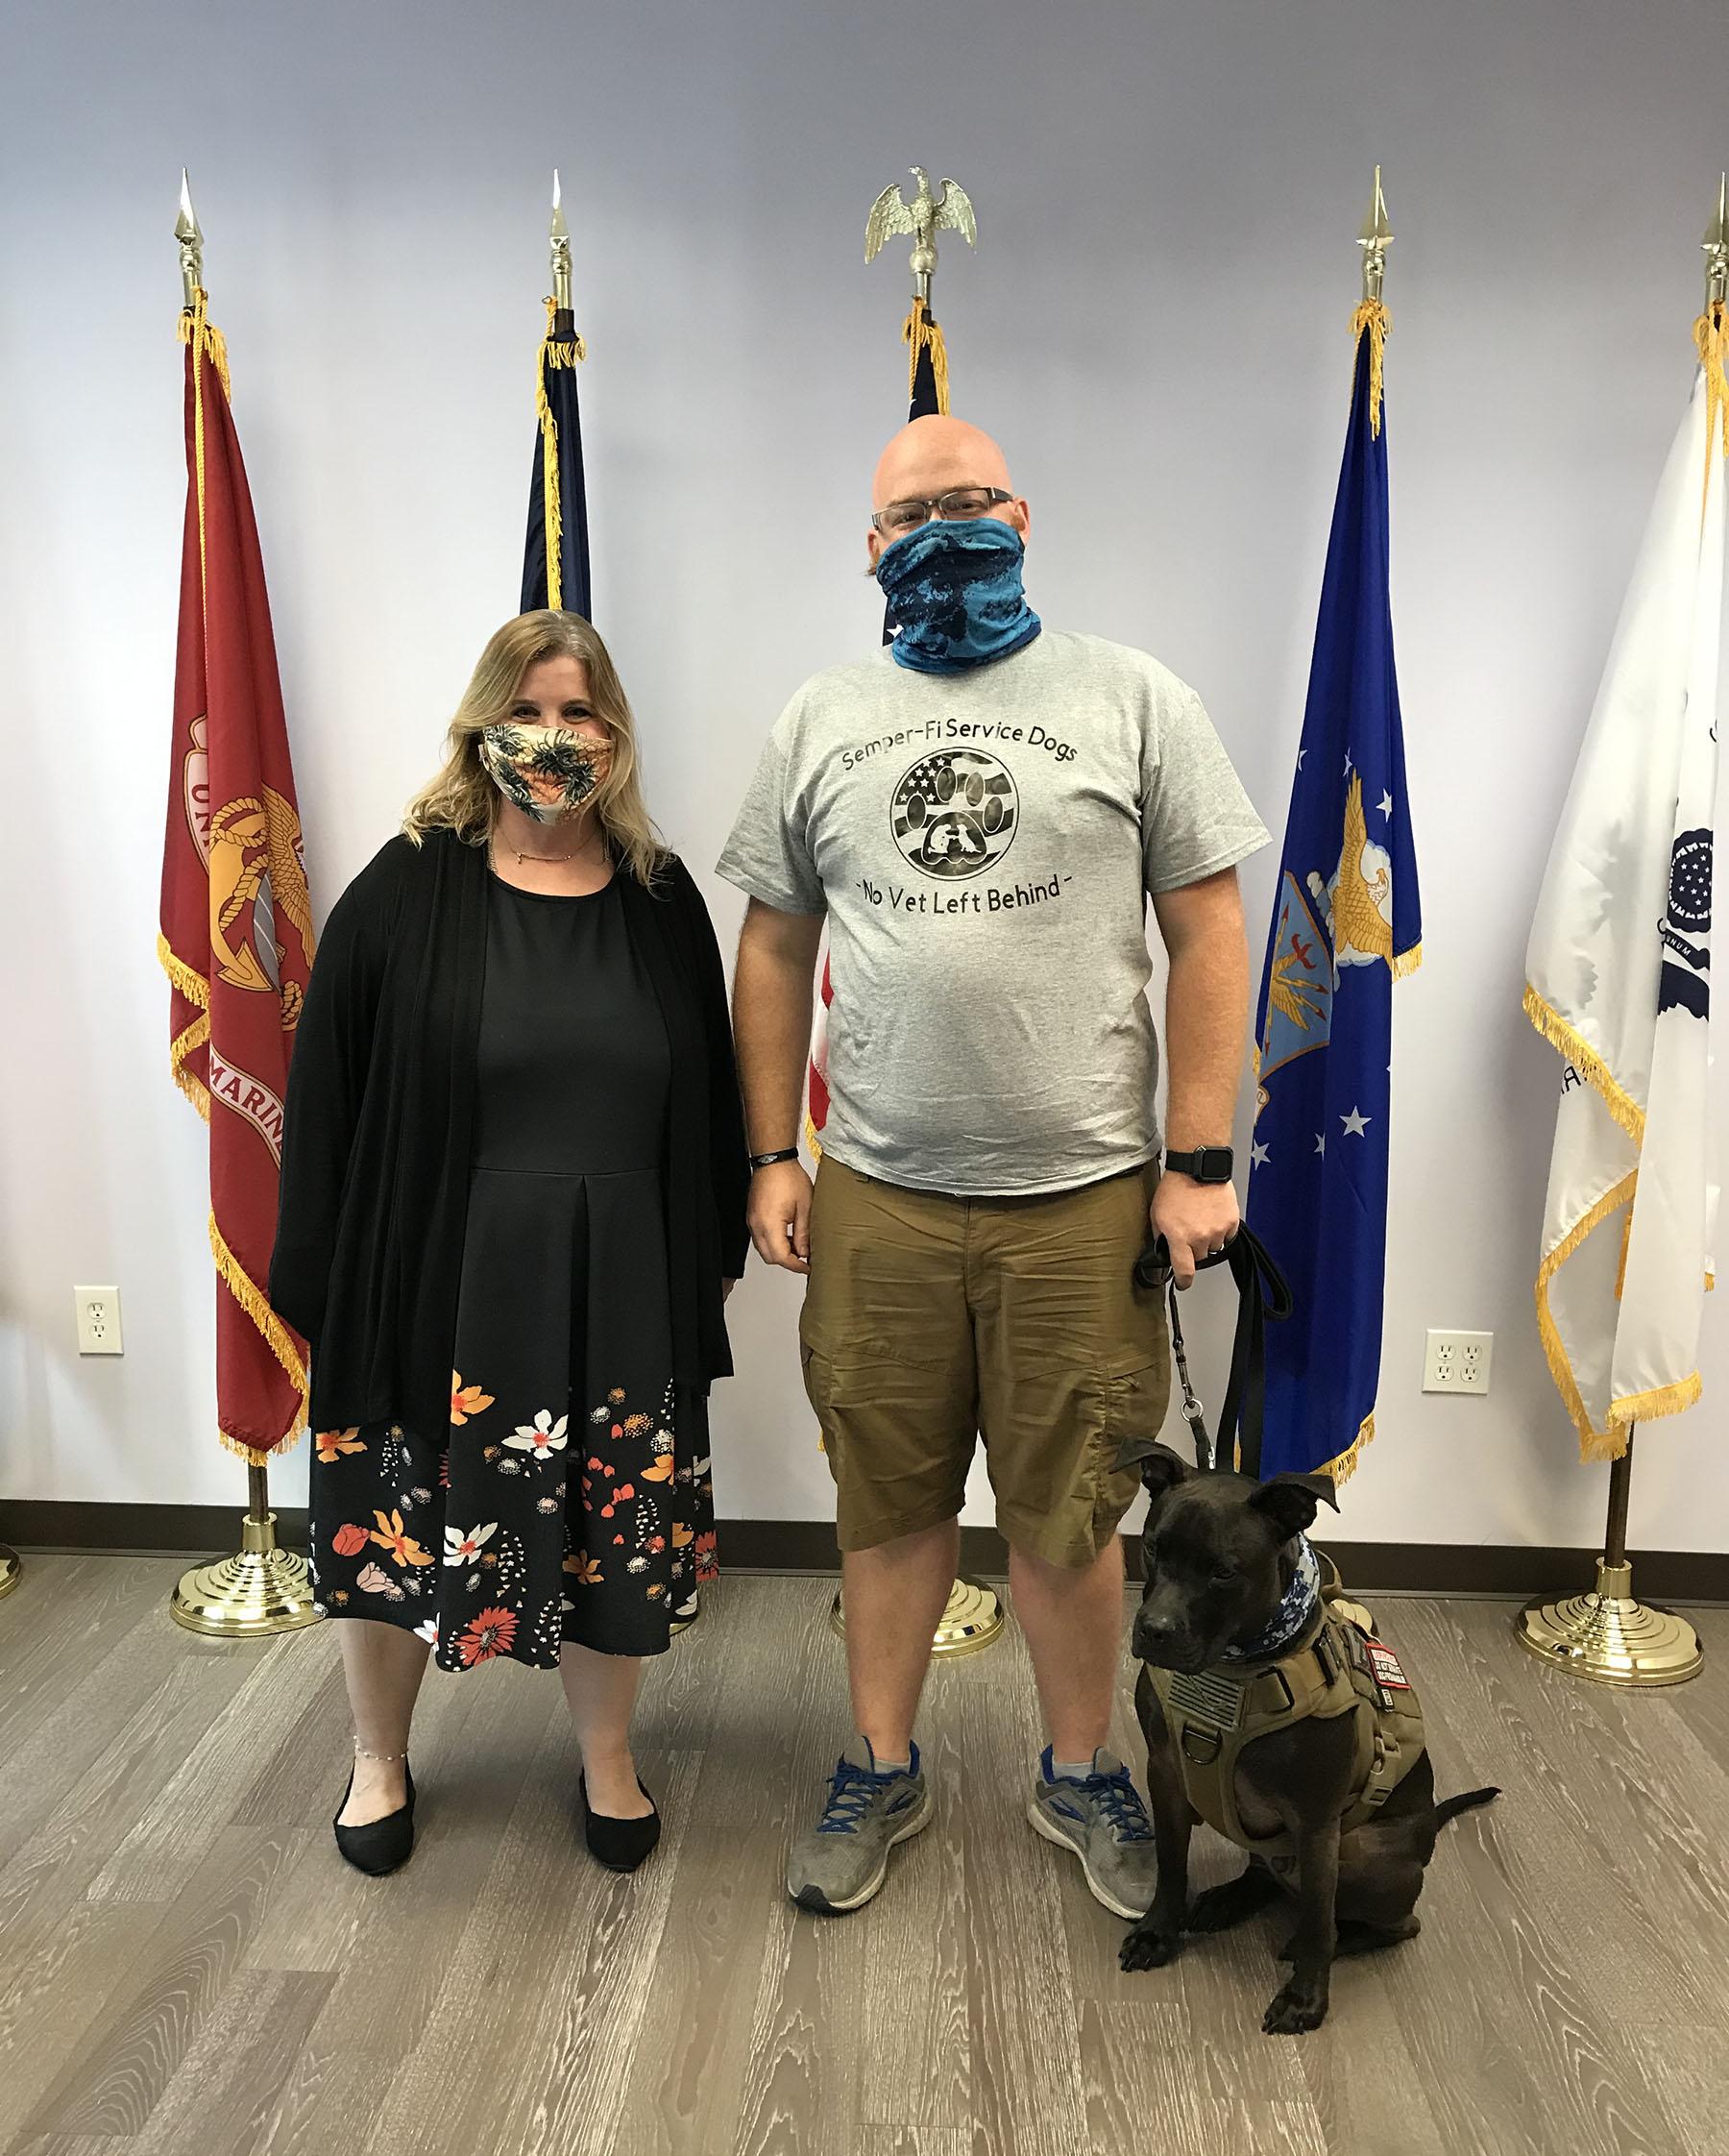 Keiser University SVA President Helps Lead Service Dog Organization